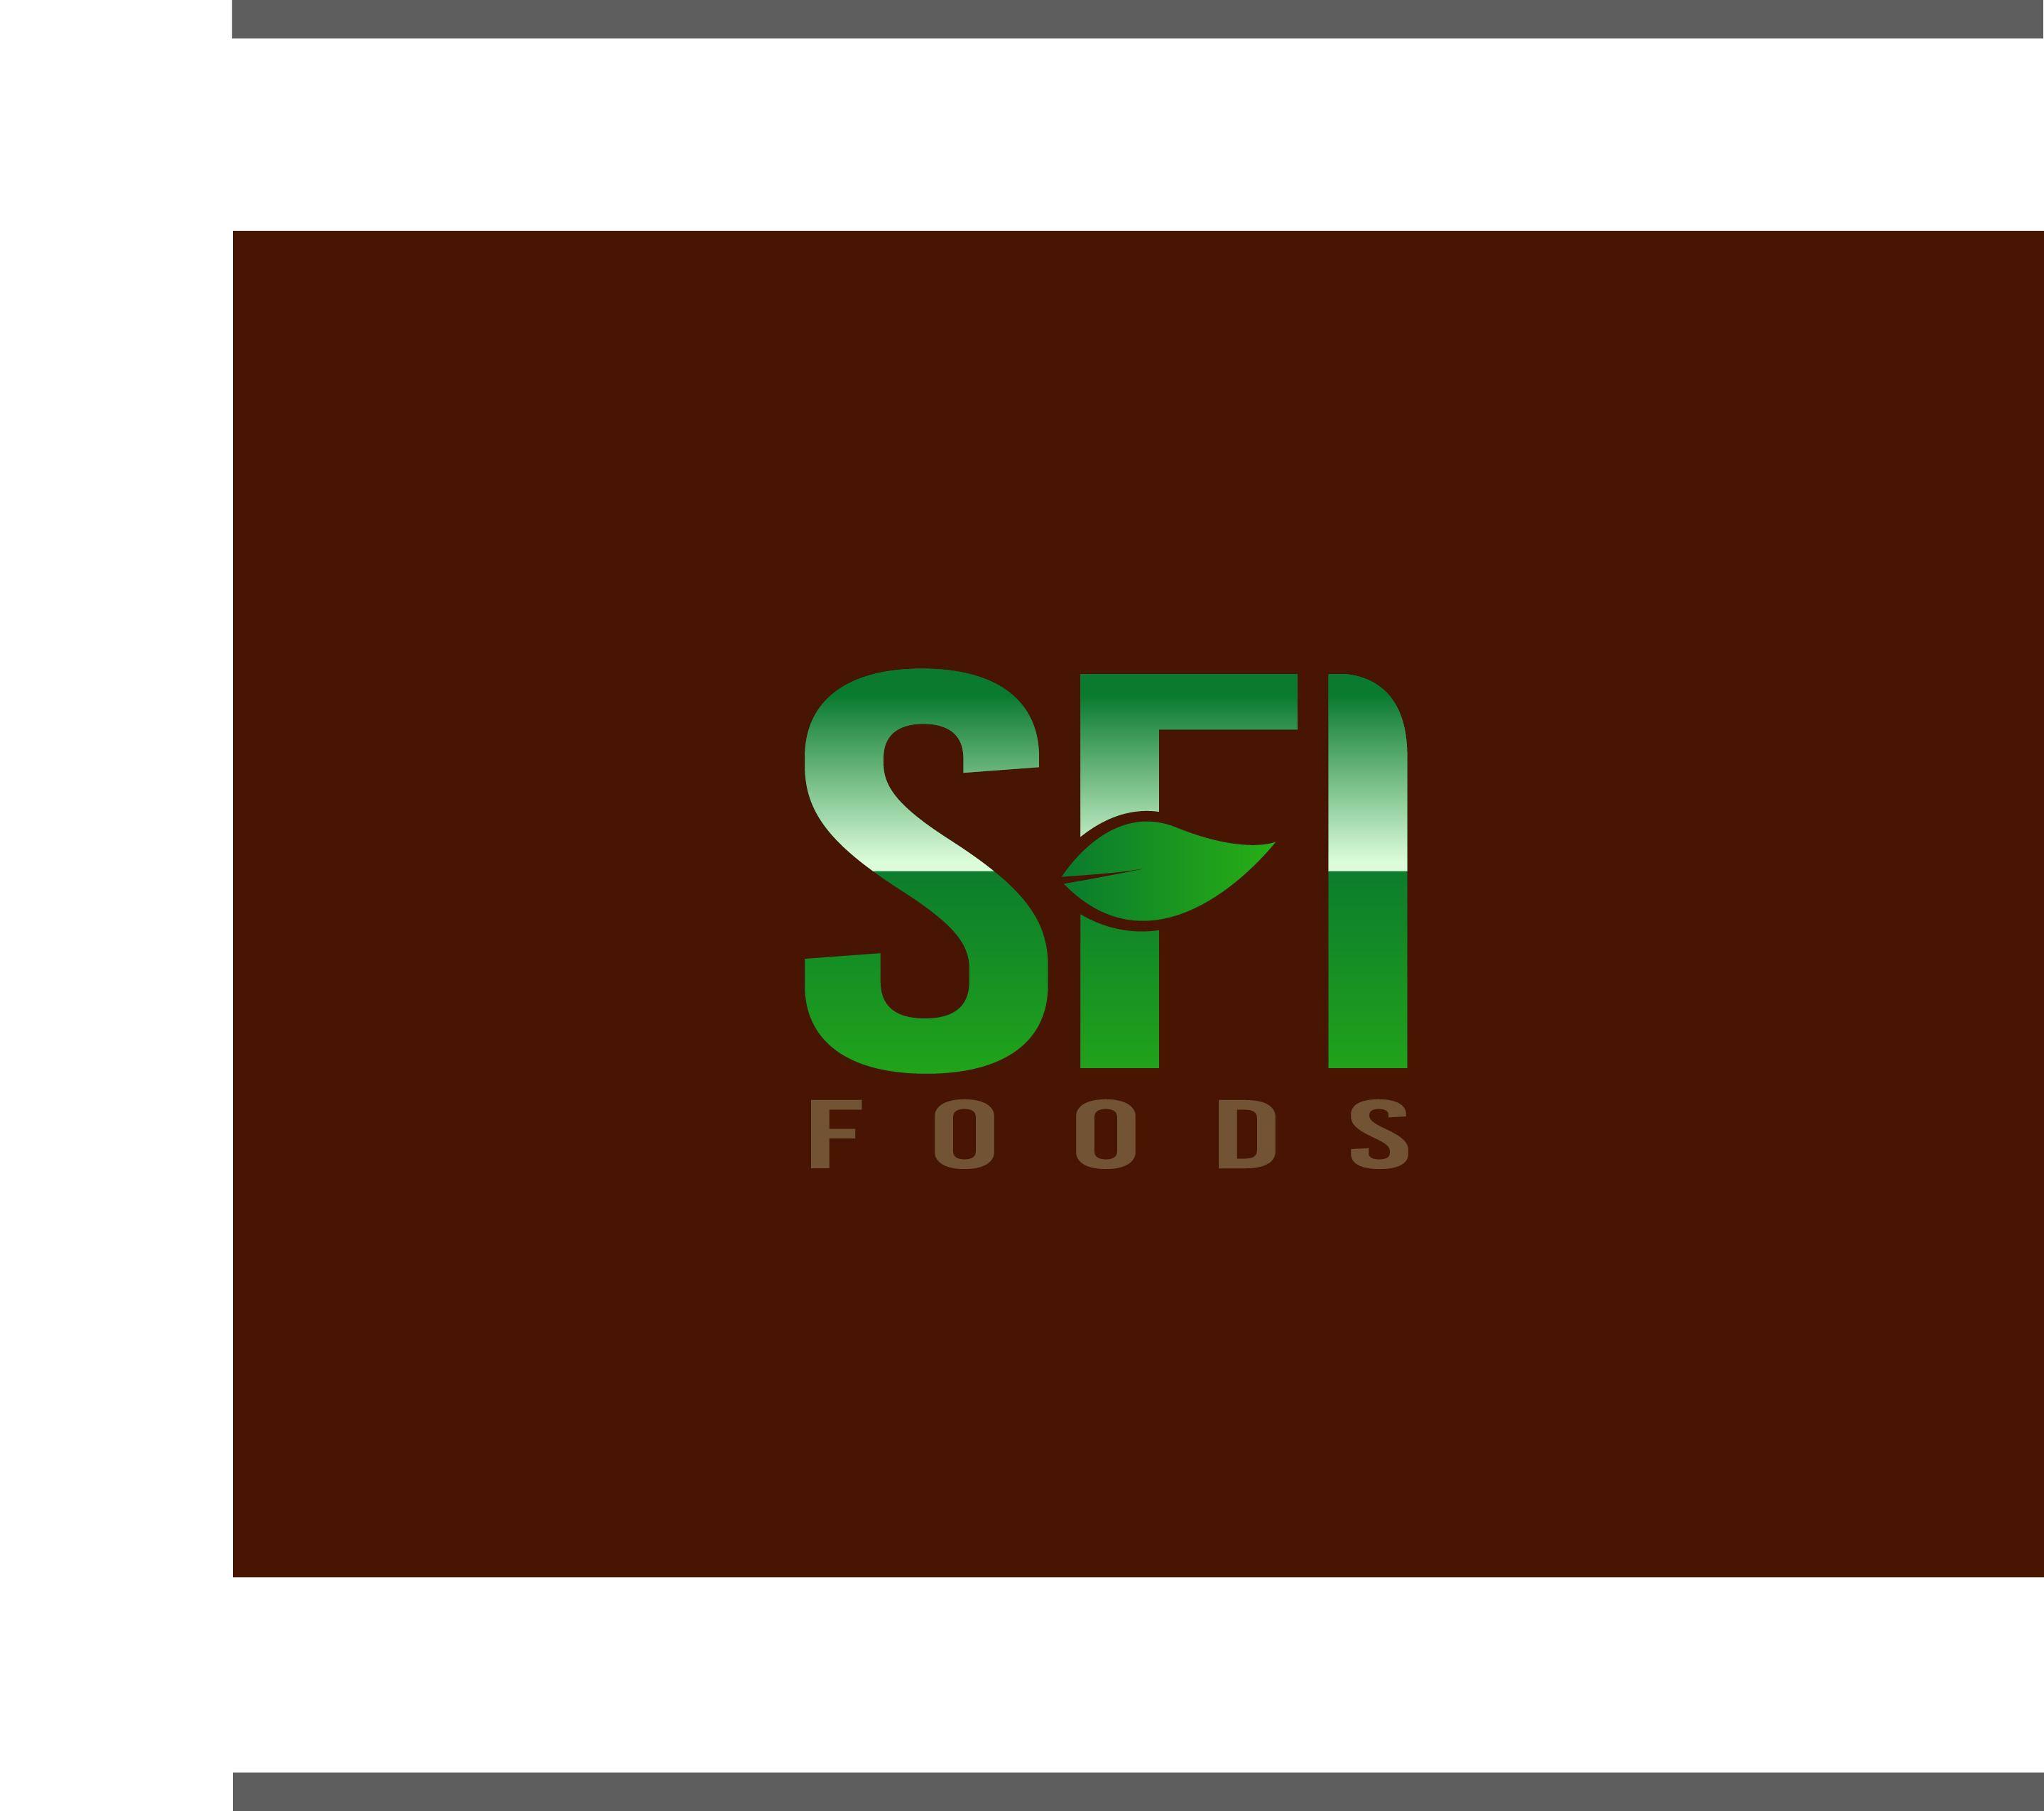 Logo Design by Allan Esclamado - Entry No. 61 in the Logo Design Contest Inspiring Logo Design for SFI.